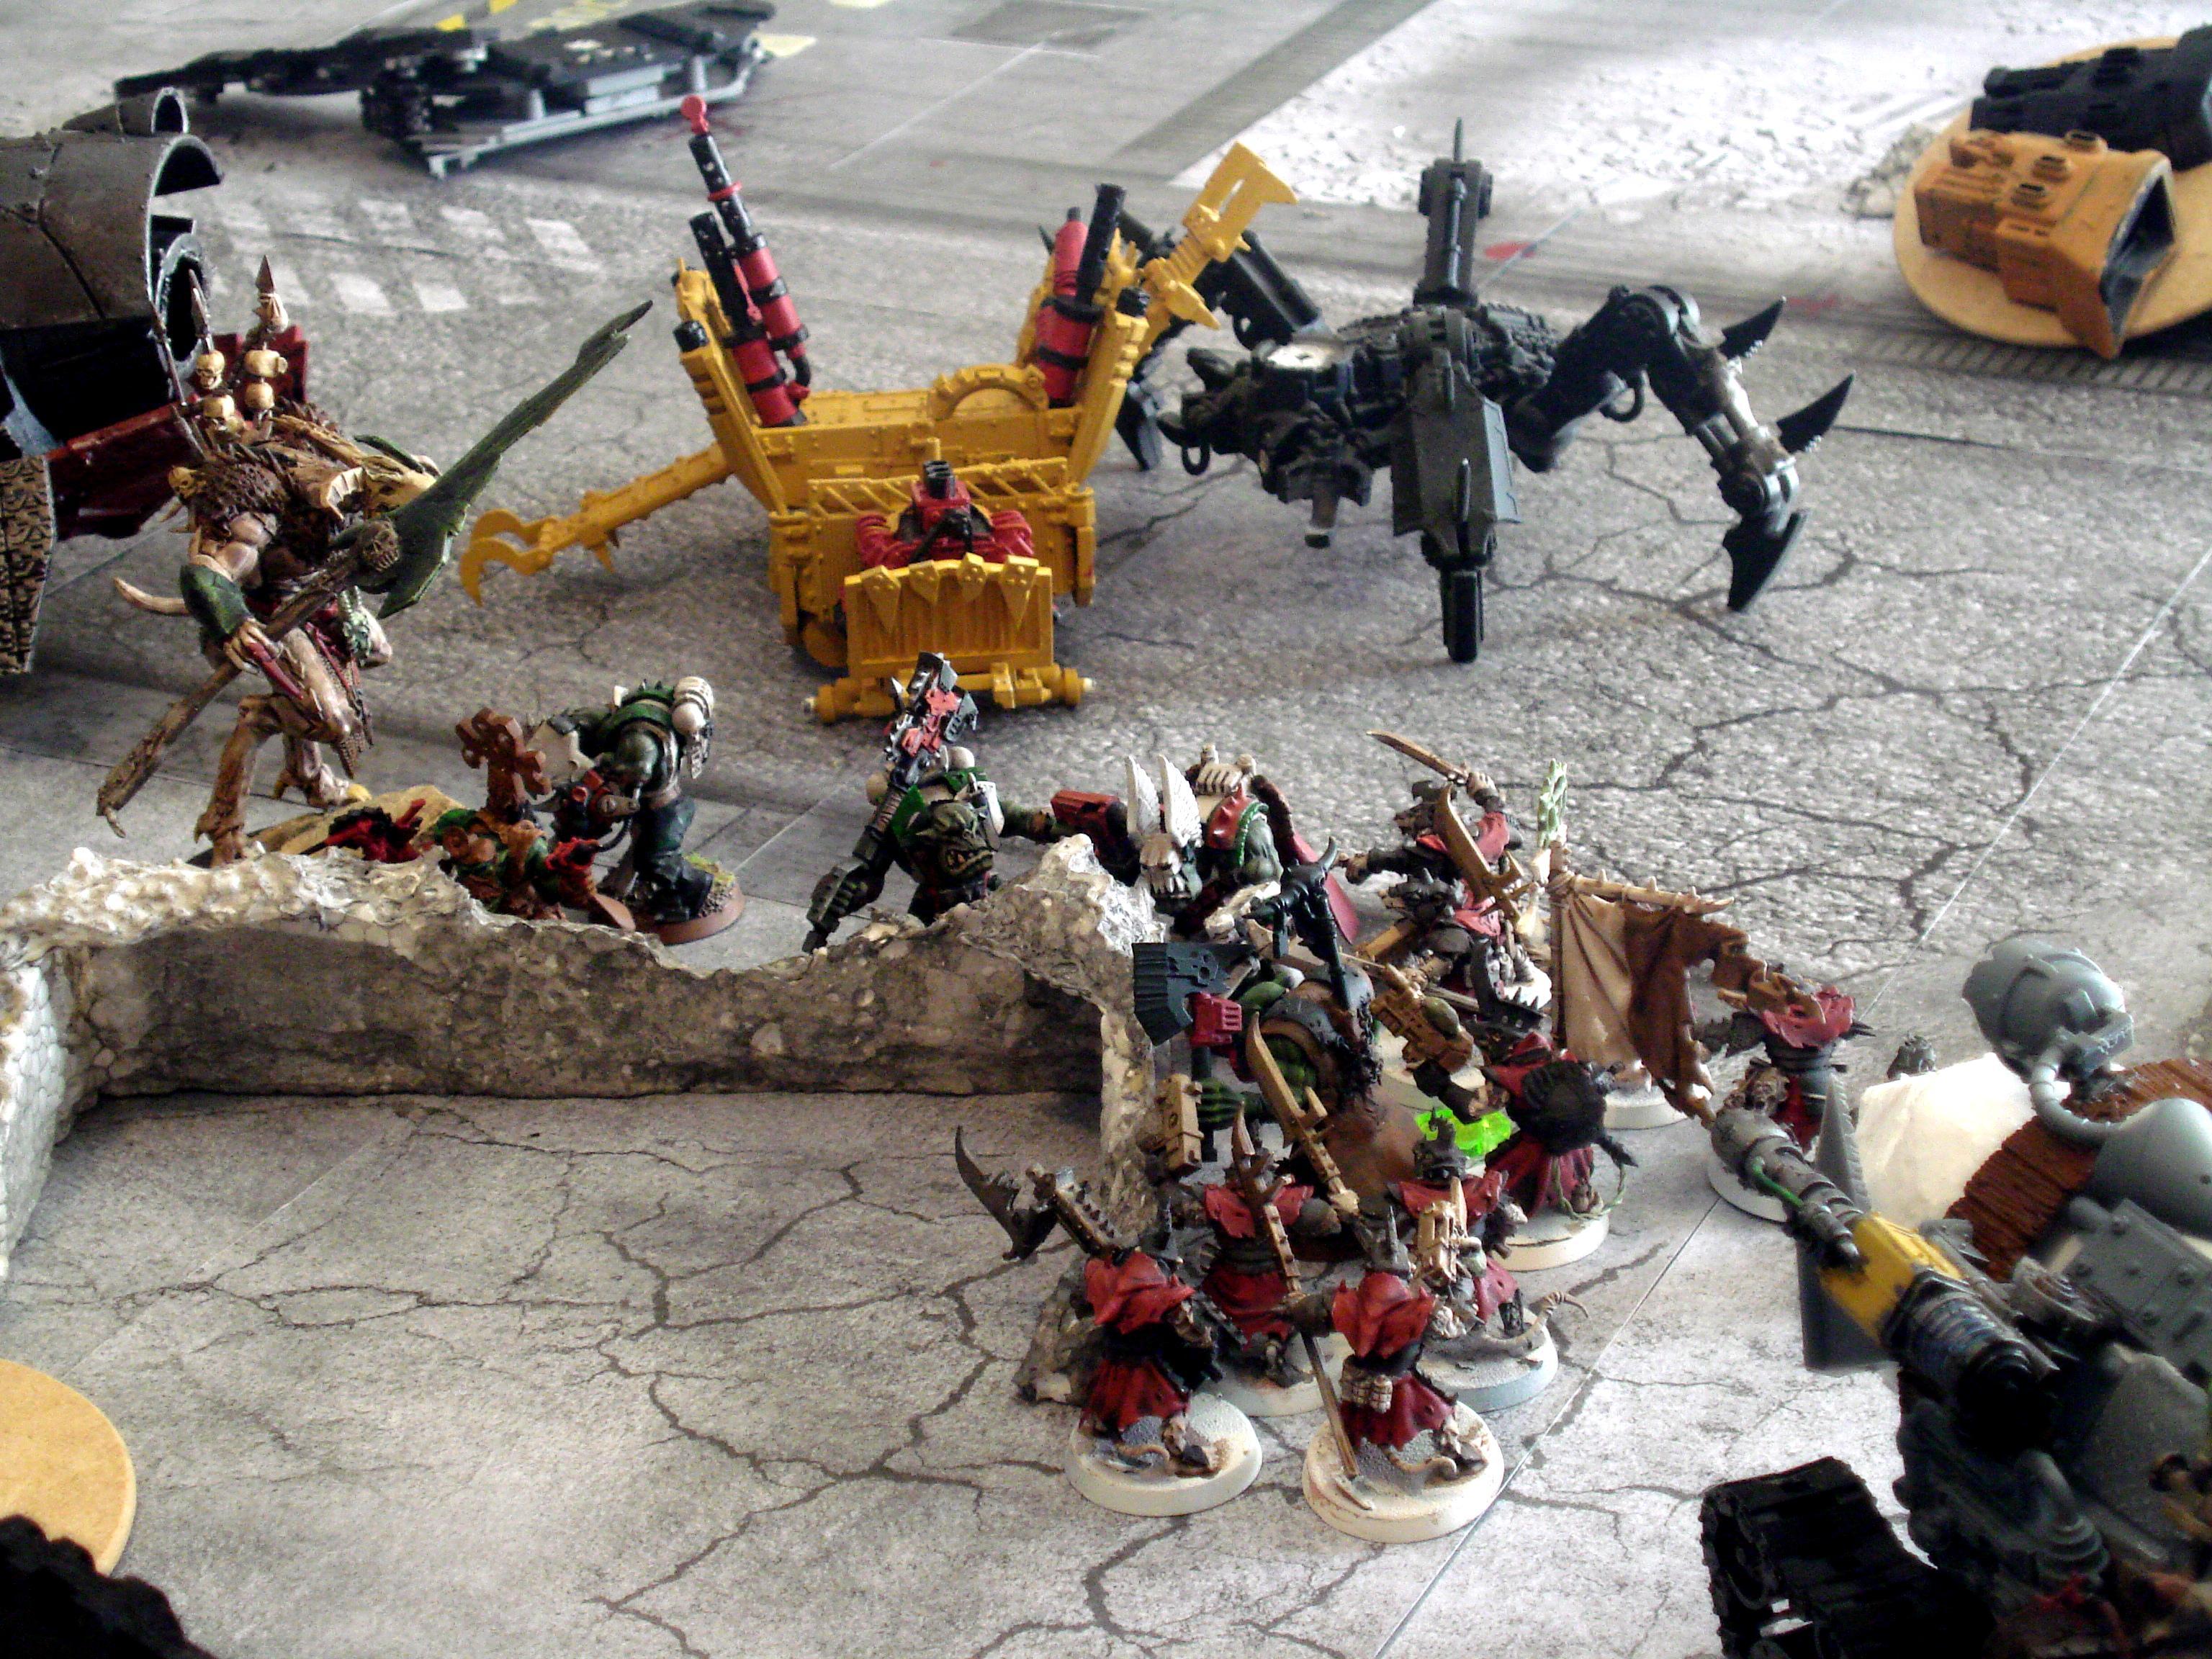 Daemons, Orks, combat 9